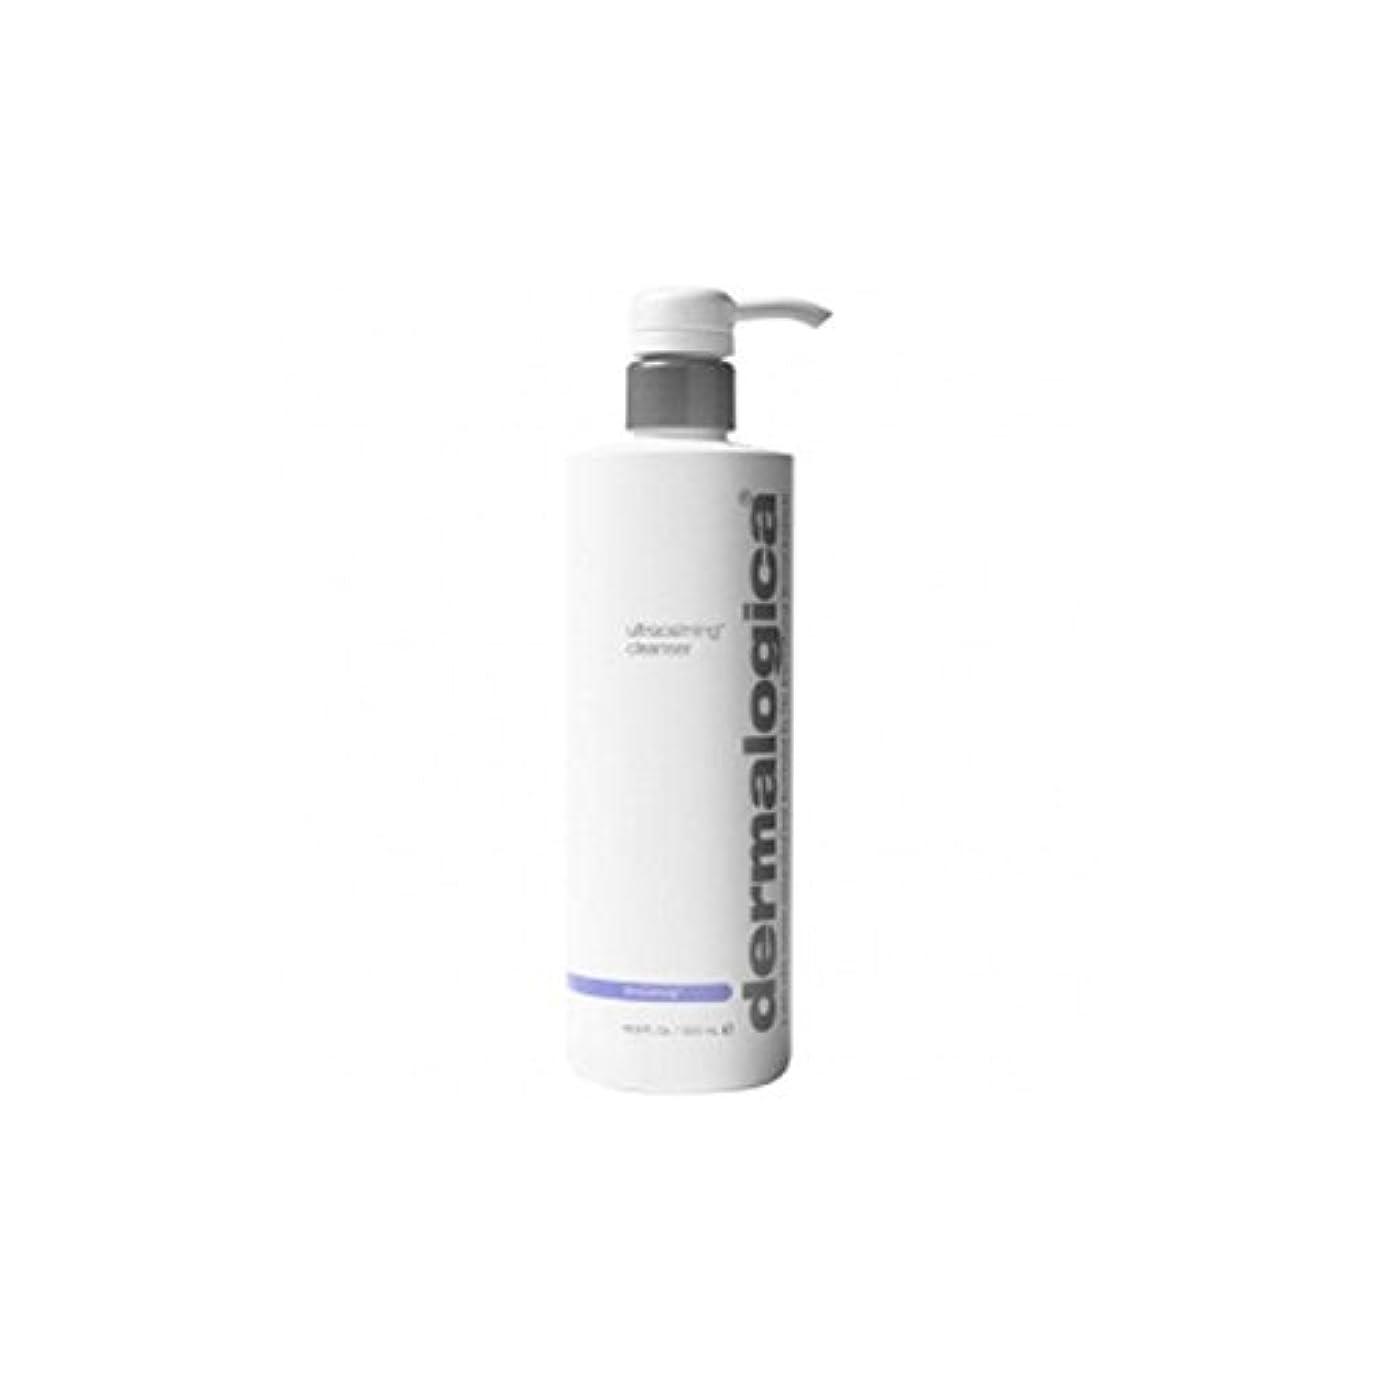 Dermalogica Ultracalming Cleanser (500ml) - ダーマロジカクレンザー(500ミリリットル) [並行輸入品]